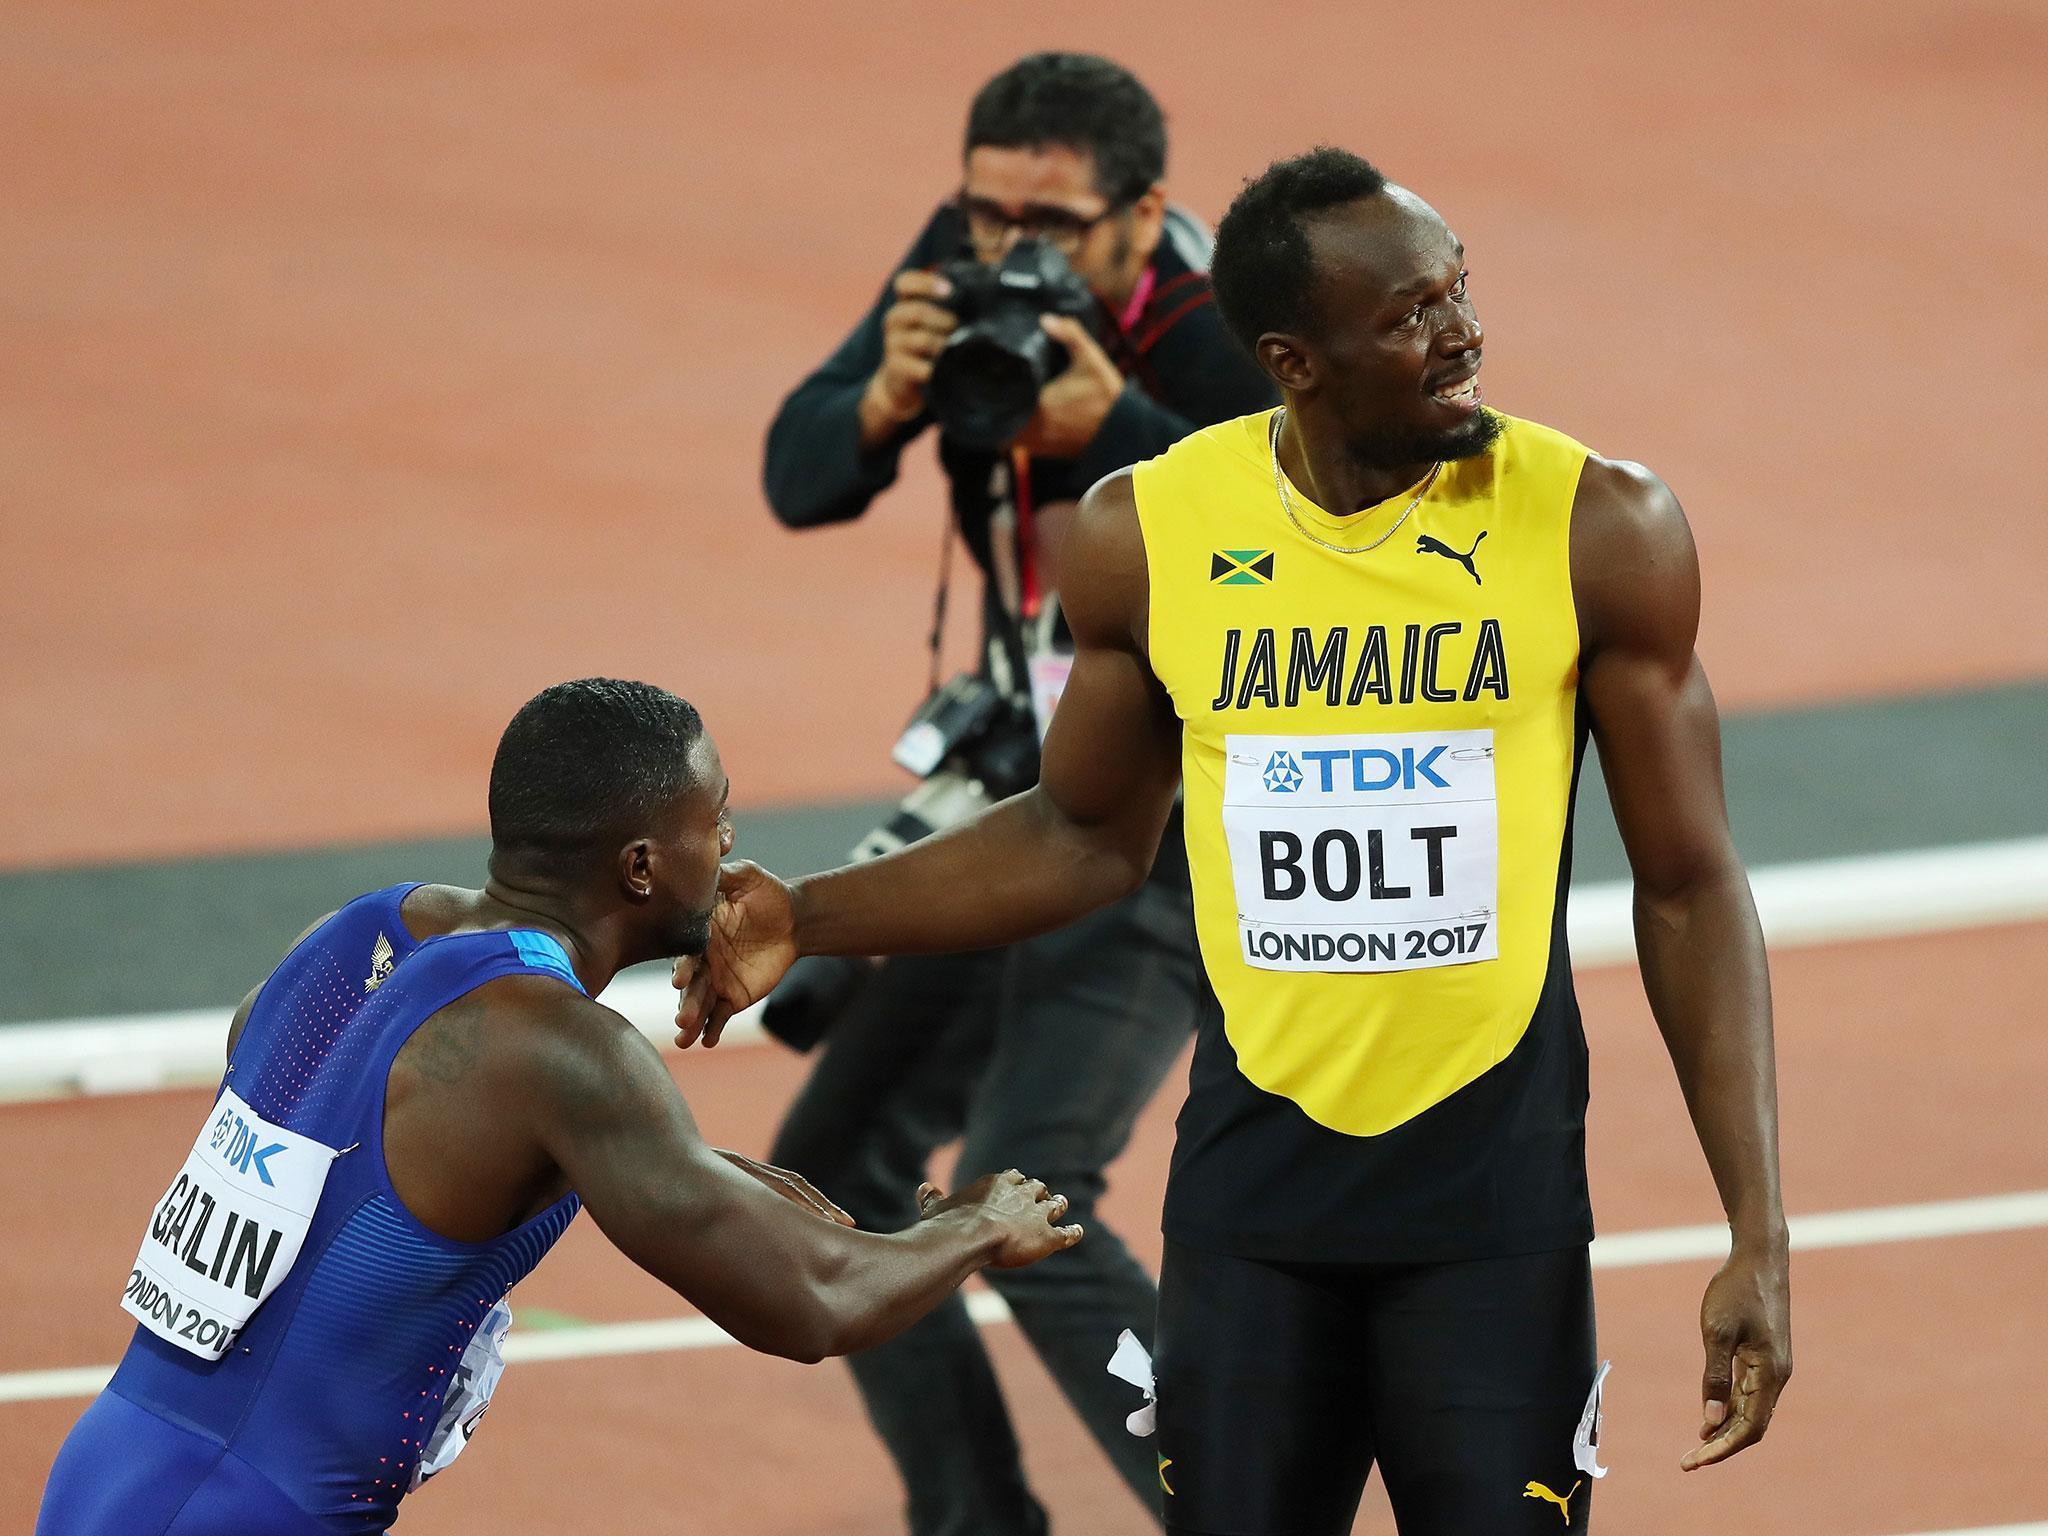 Usain Bolt Wins Race at London World & Experts Explain His